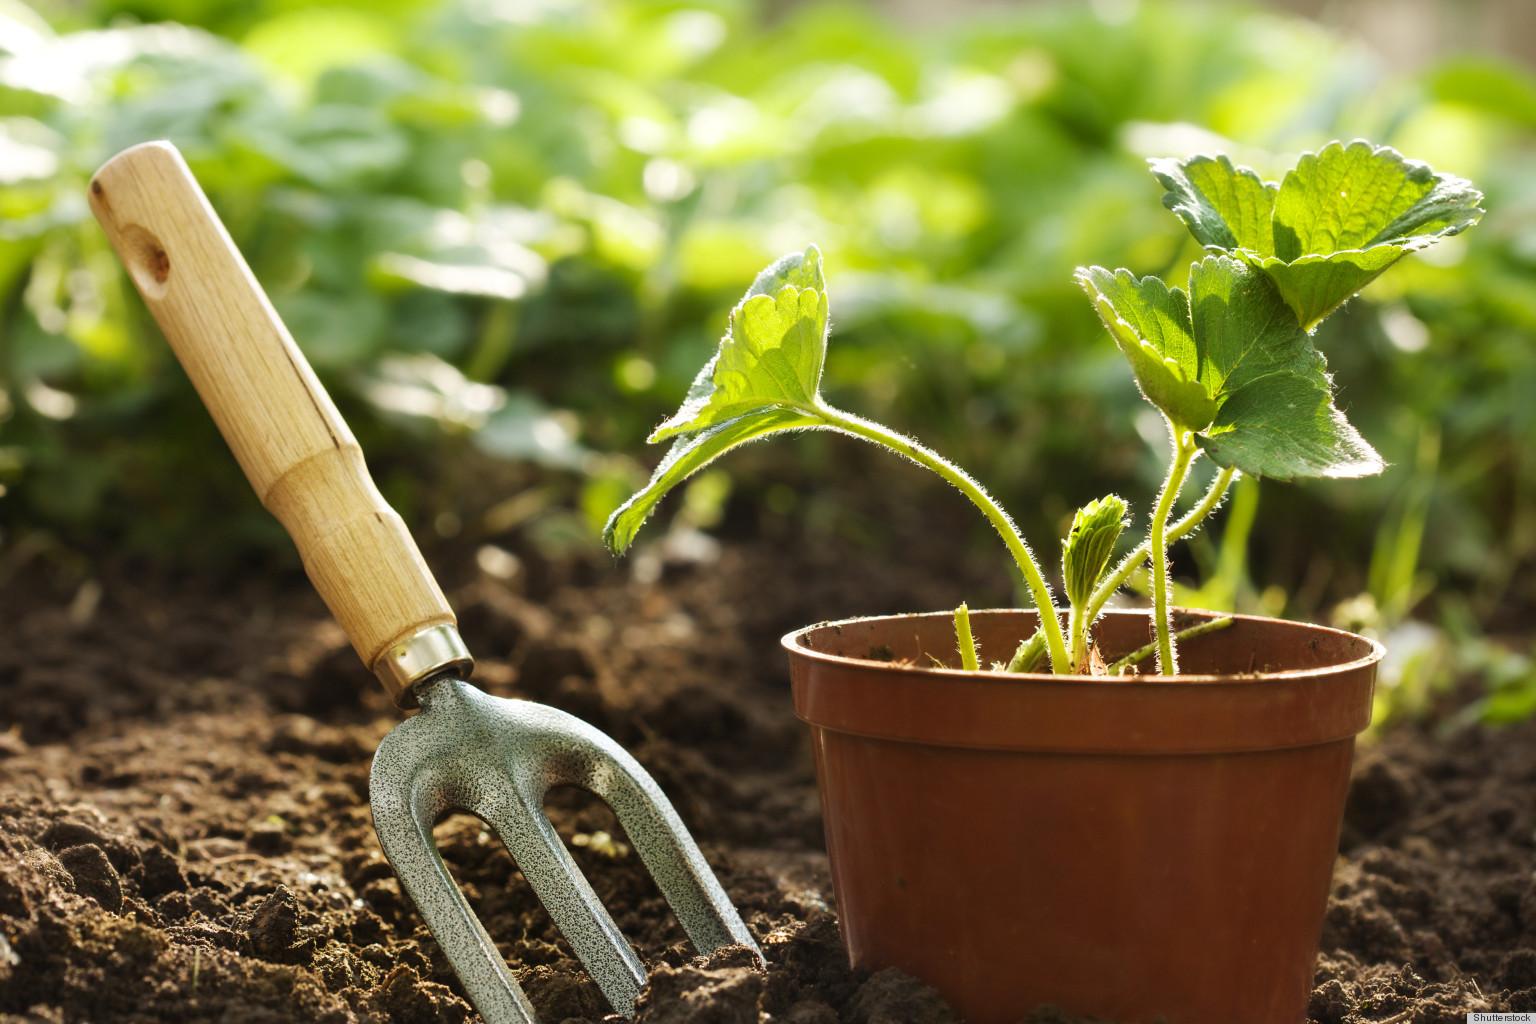 Organic Gardening – Say NO to Tilling